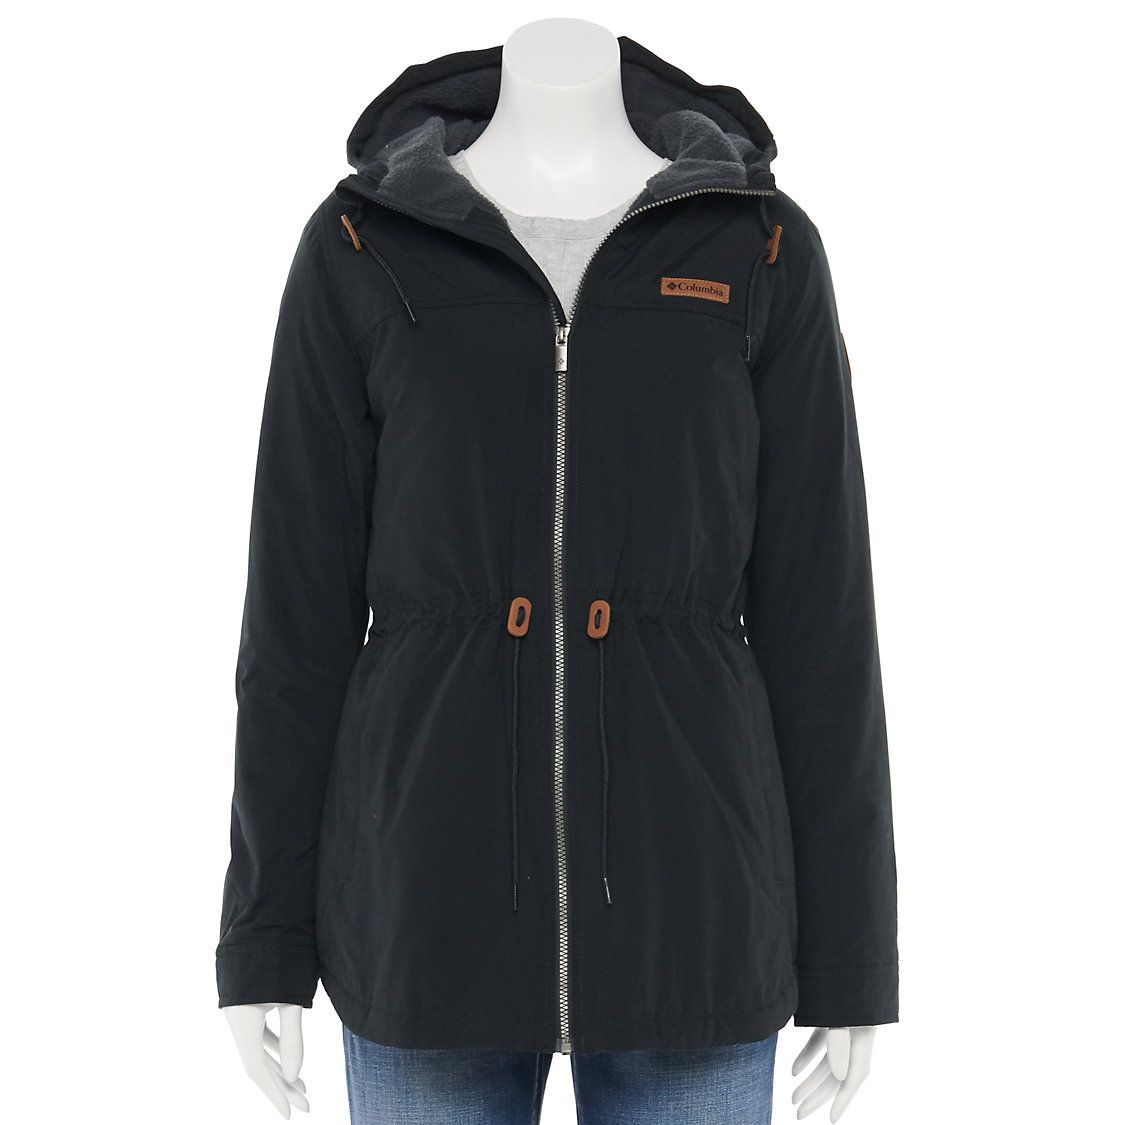 Women S Columbia Chatfield Hill Print Sherpa Lined Jacket Hooded Anorak Jacket Anorak Jacket Jackets [ 1125 x 1125 Pixel ]